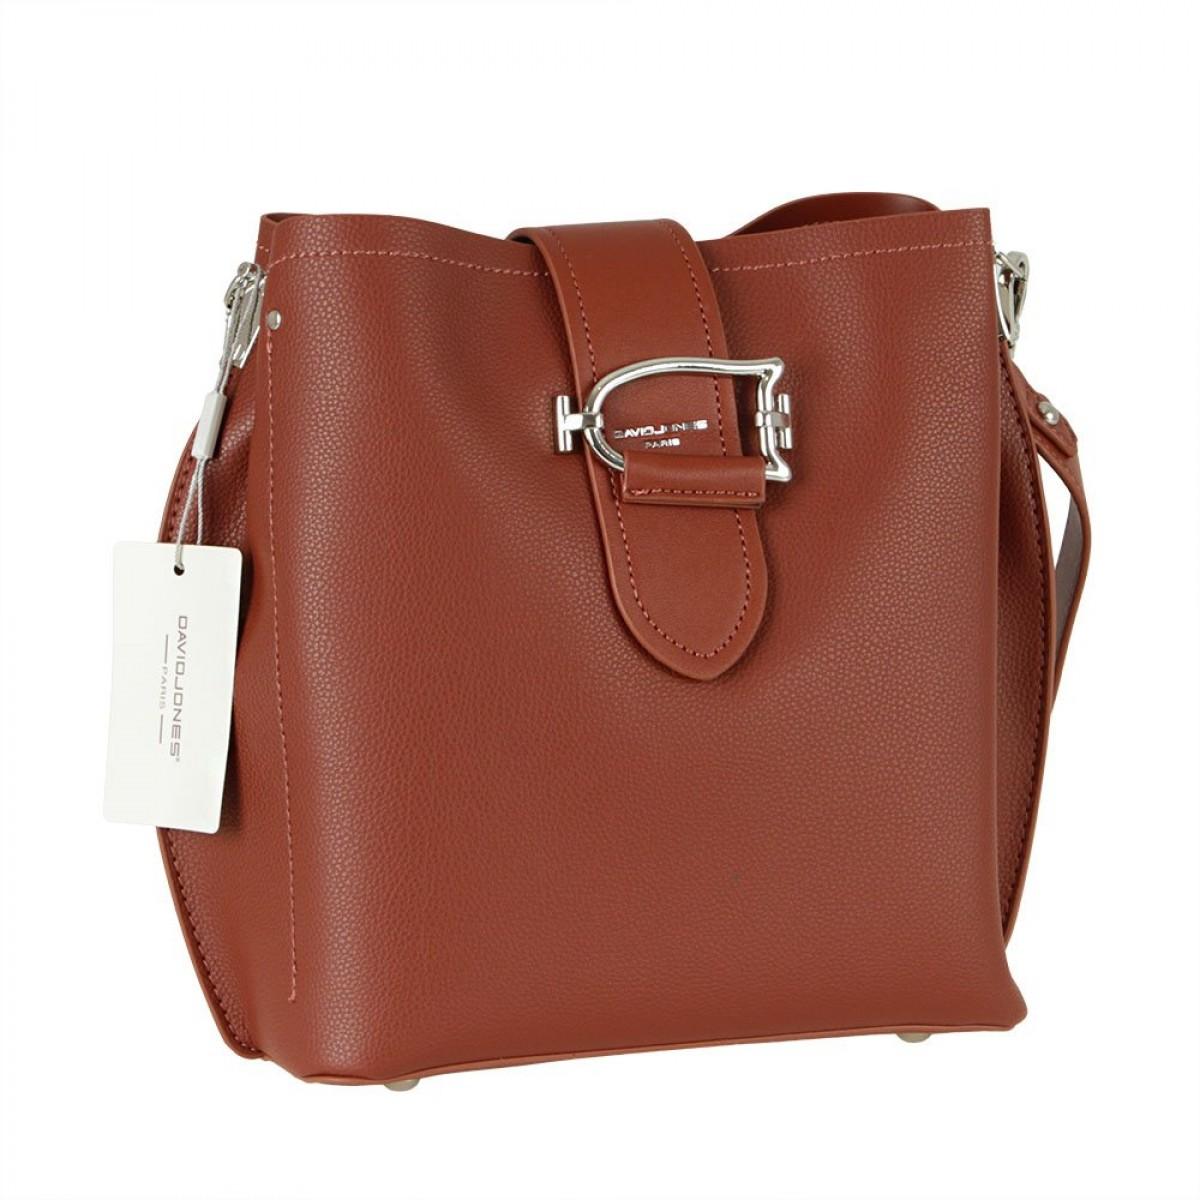 Жіноча сумка David Jones 6403-2 BROWN